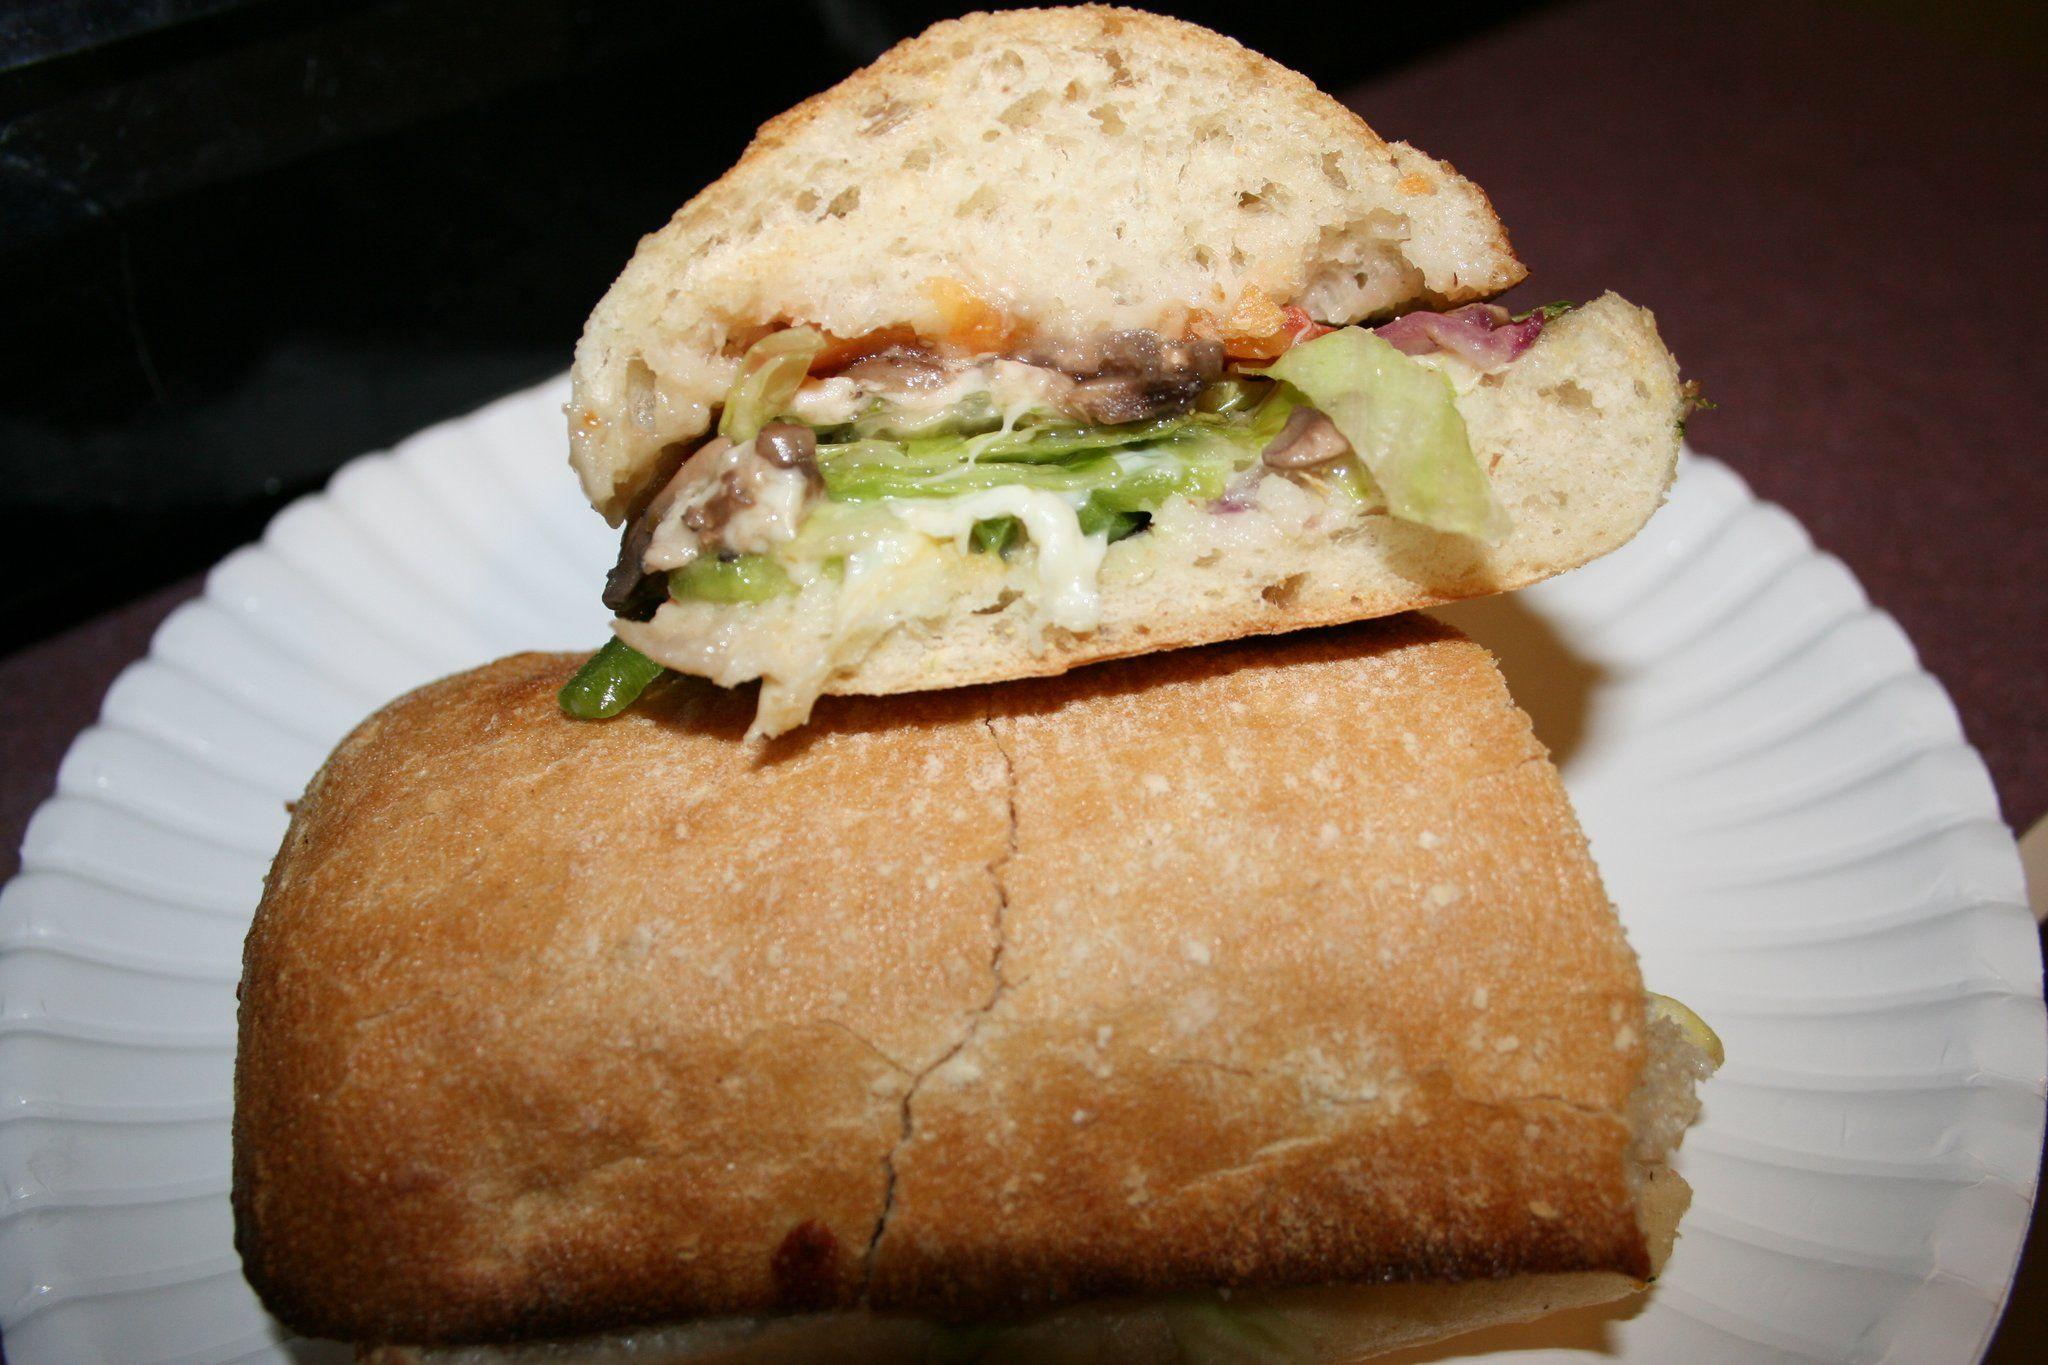 Www Vocellipizza Com Order 703 921 9214 6126 Rose Hill Drive 15 B Alexandria Va 22310 Veggie Sub Sandwich From Vocell Sub Sandwiches Delicious Vegetarian Food